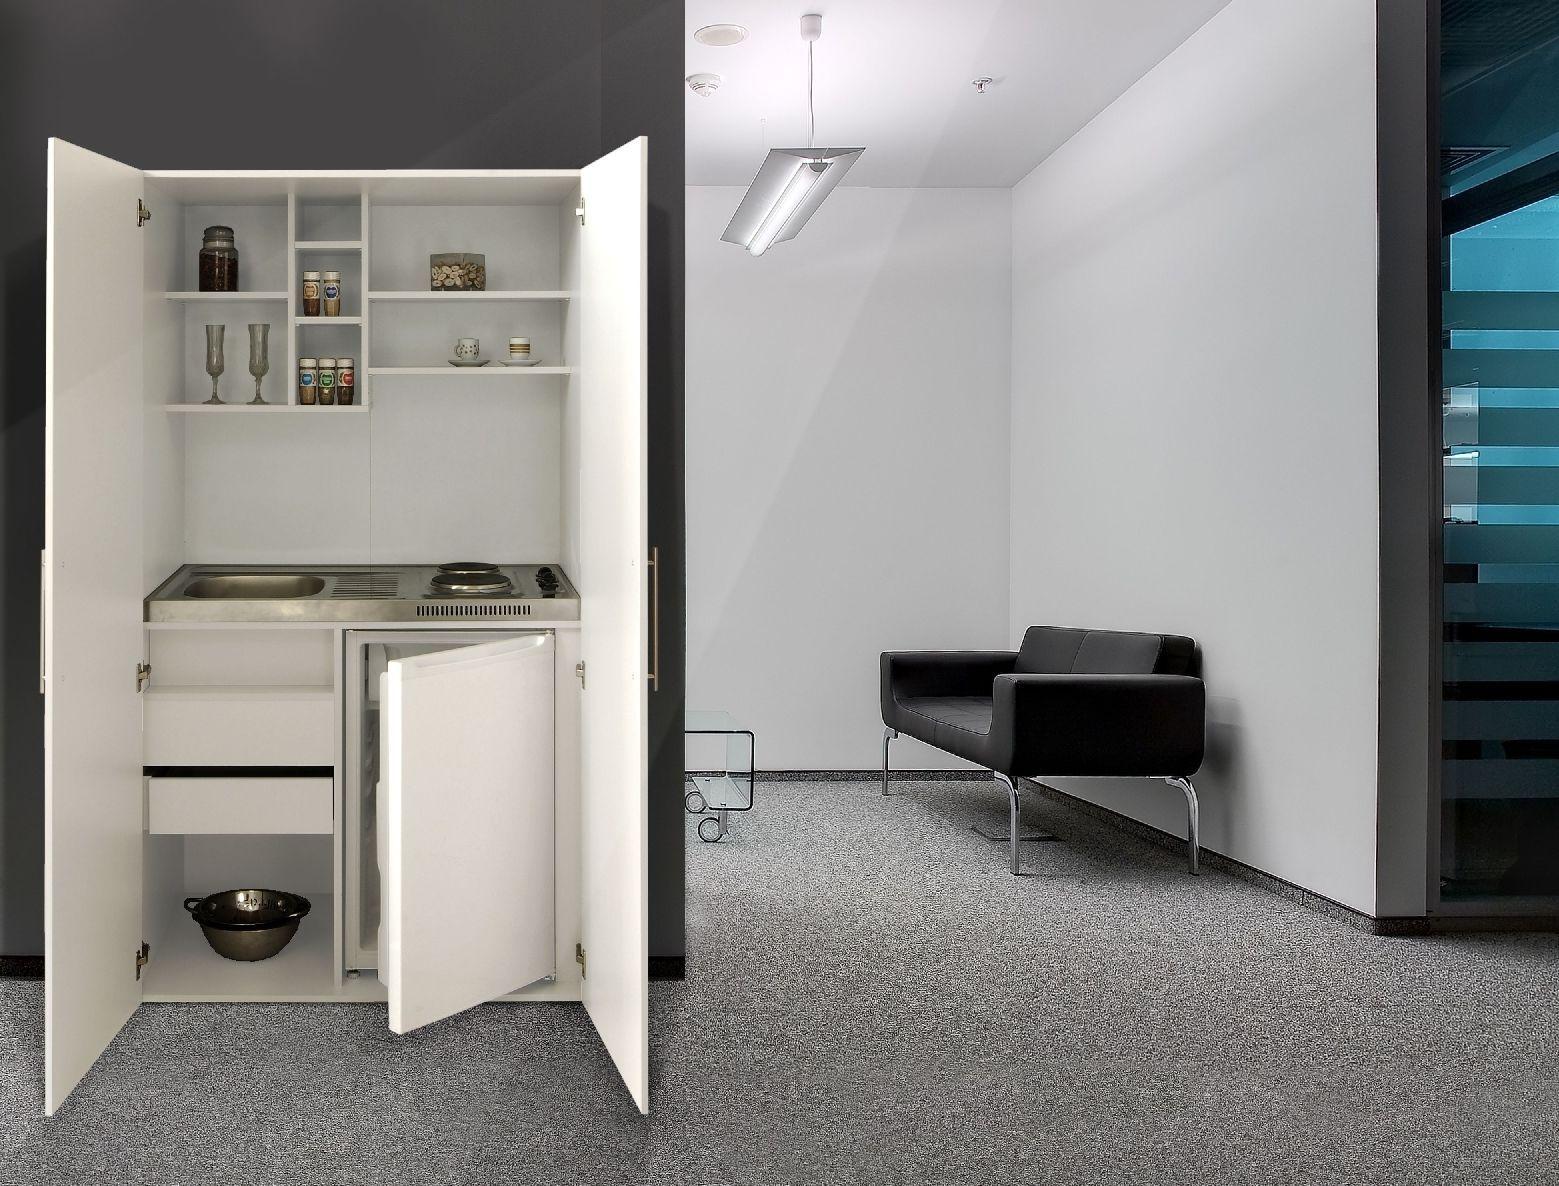 Respekta Single Büroküche Pantry Küche Miniküche